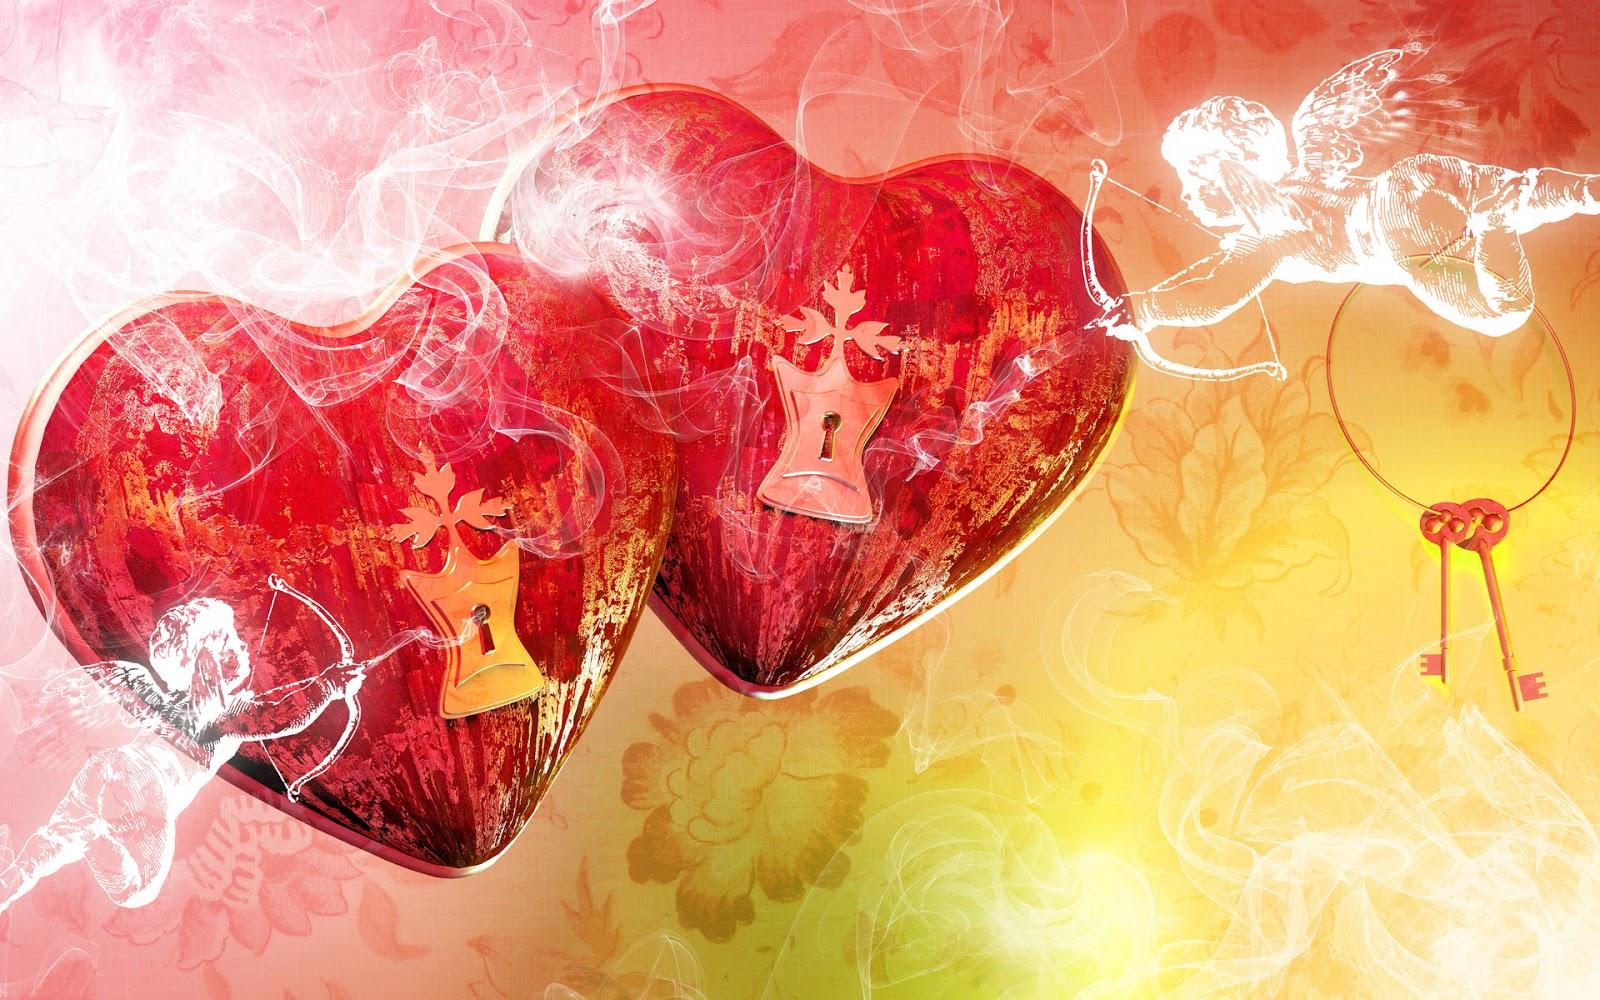 Fondos De Pantalla San Valentin Gratis: Fondo De Pantalla Cerrojo Corazon Dia De San Valentin